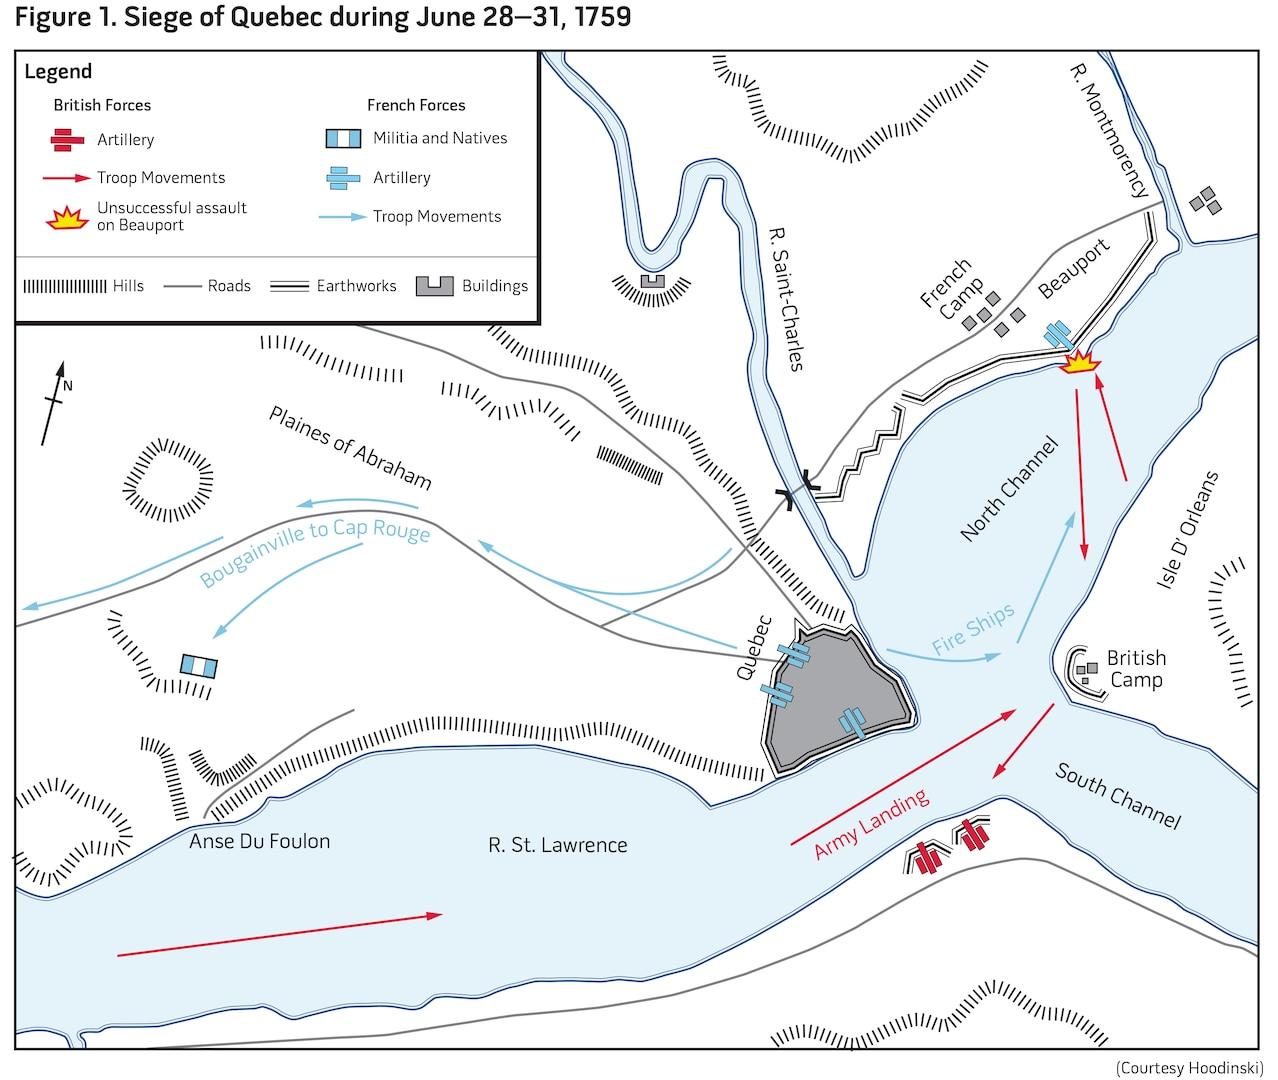 Figure 1. Siege of Quebec during June 28-31, 1759